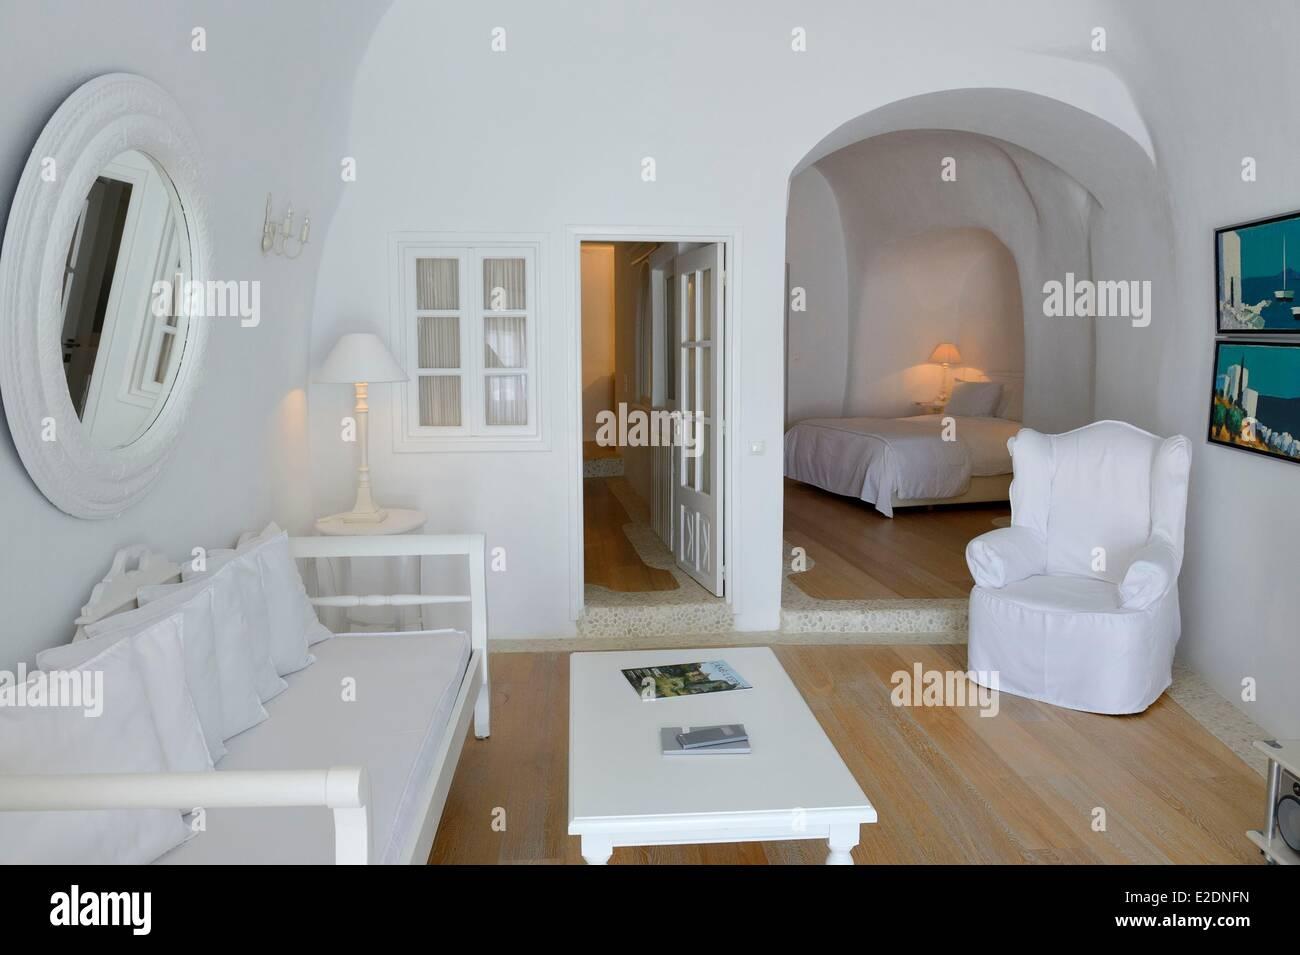 Greece Cyclades Aegean Sea Santorini (Thira or Thera) village of Oia Relais & Chateaux hotel Kirini Suites & - Stock Image